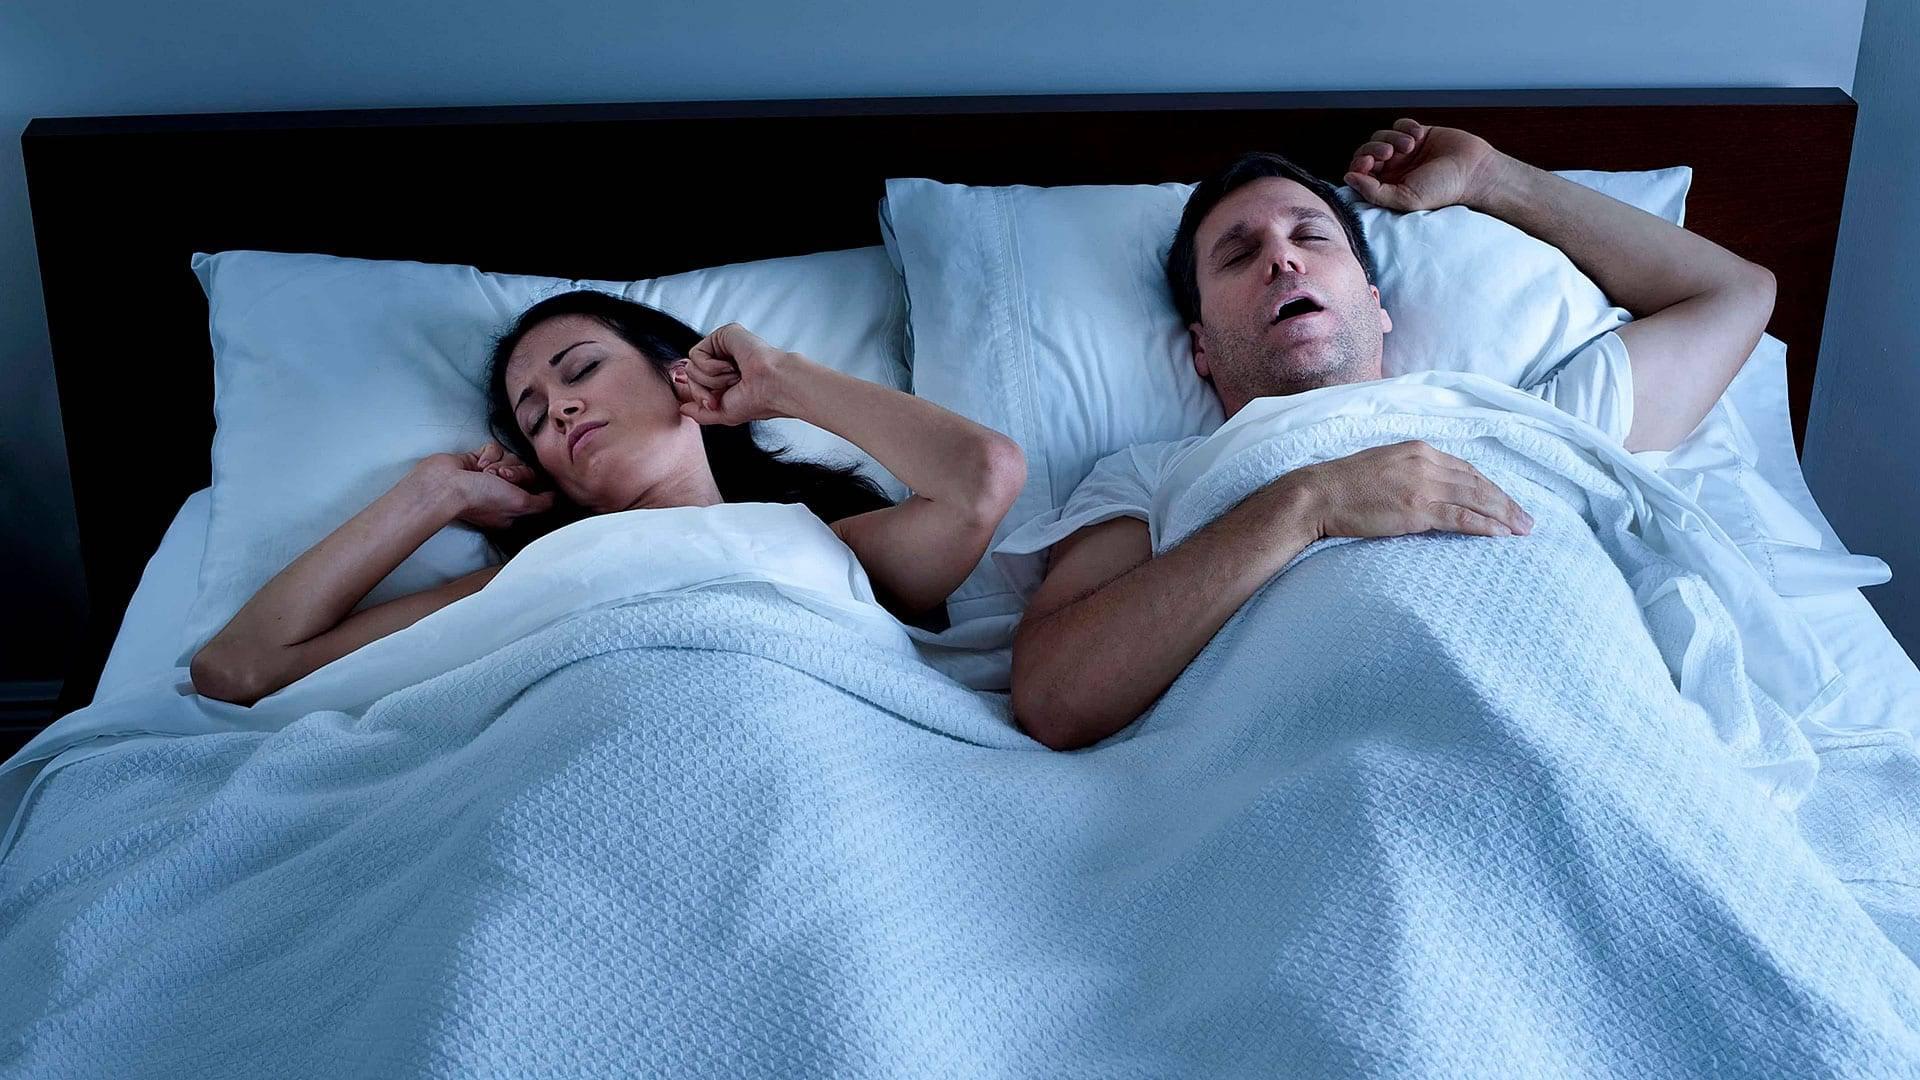 Dental And Denture Care Center Sleep Apnea